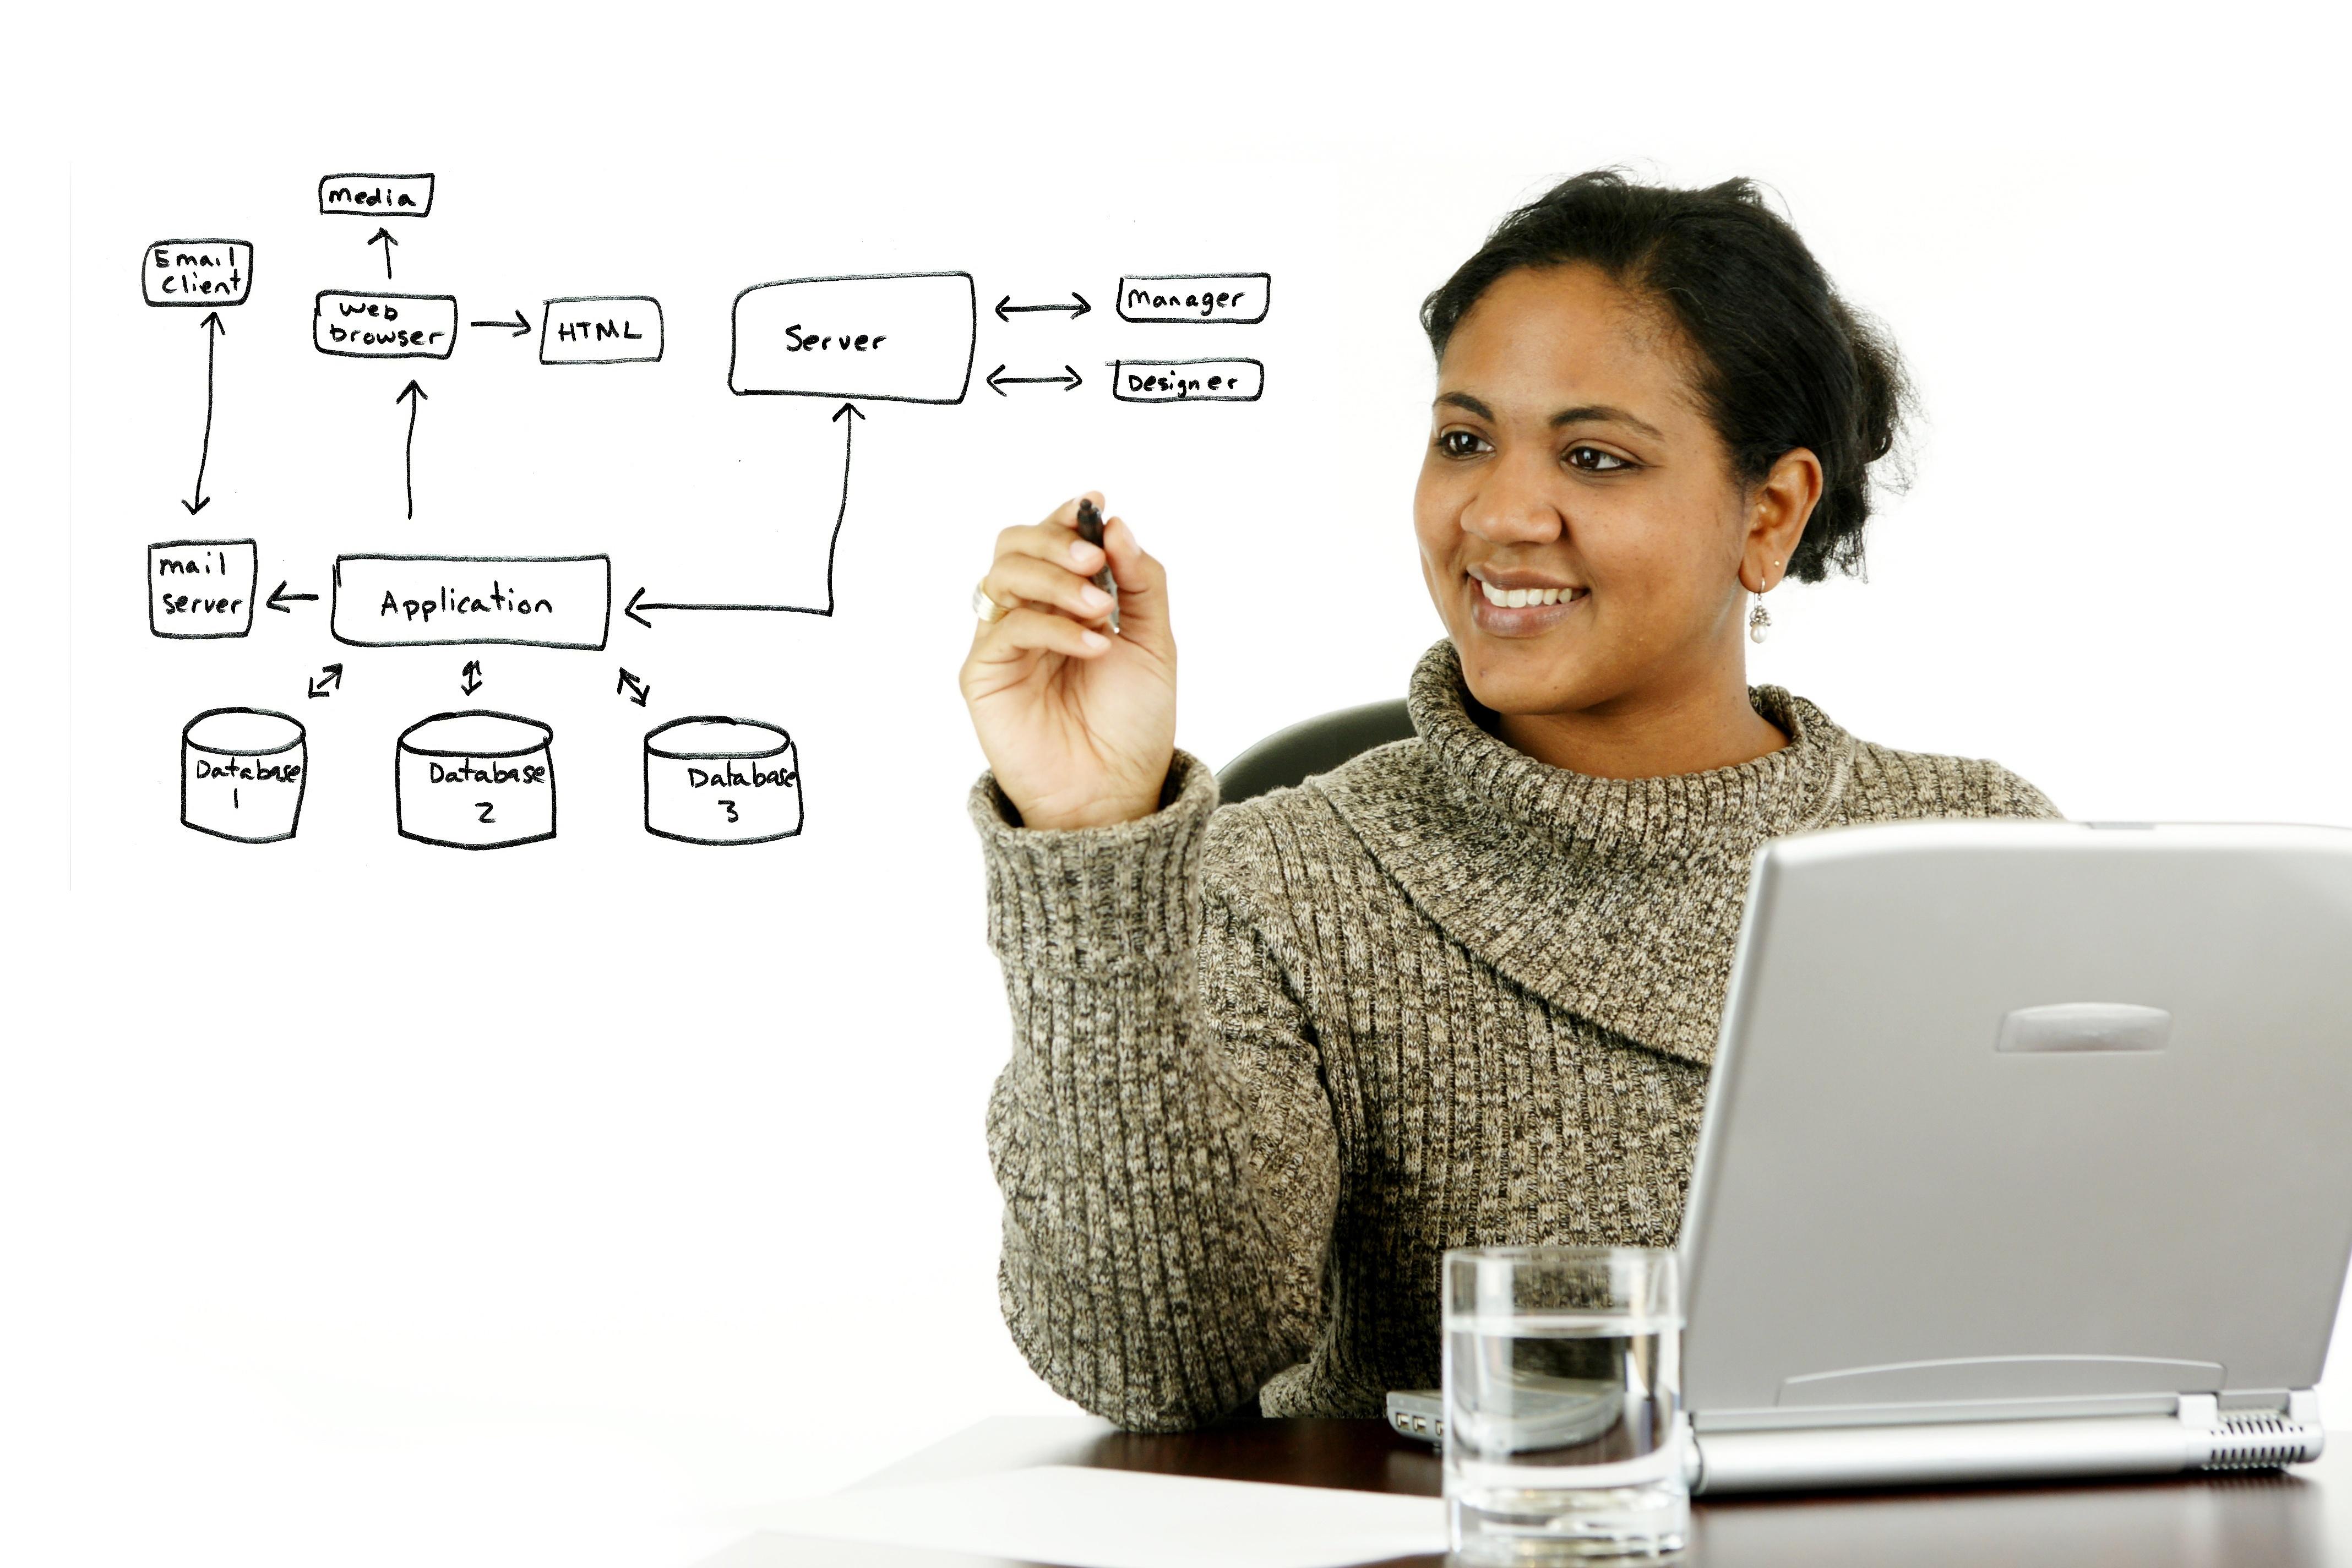 Why aren't more women working in tech fields?